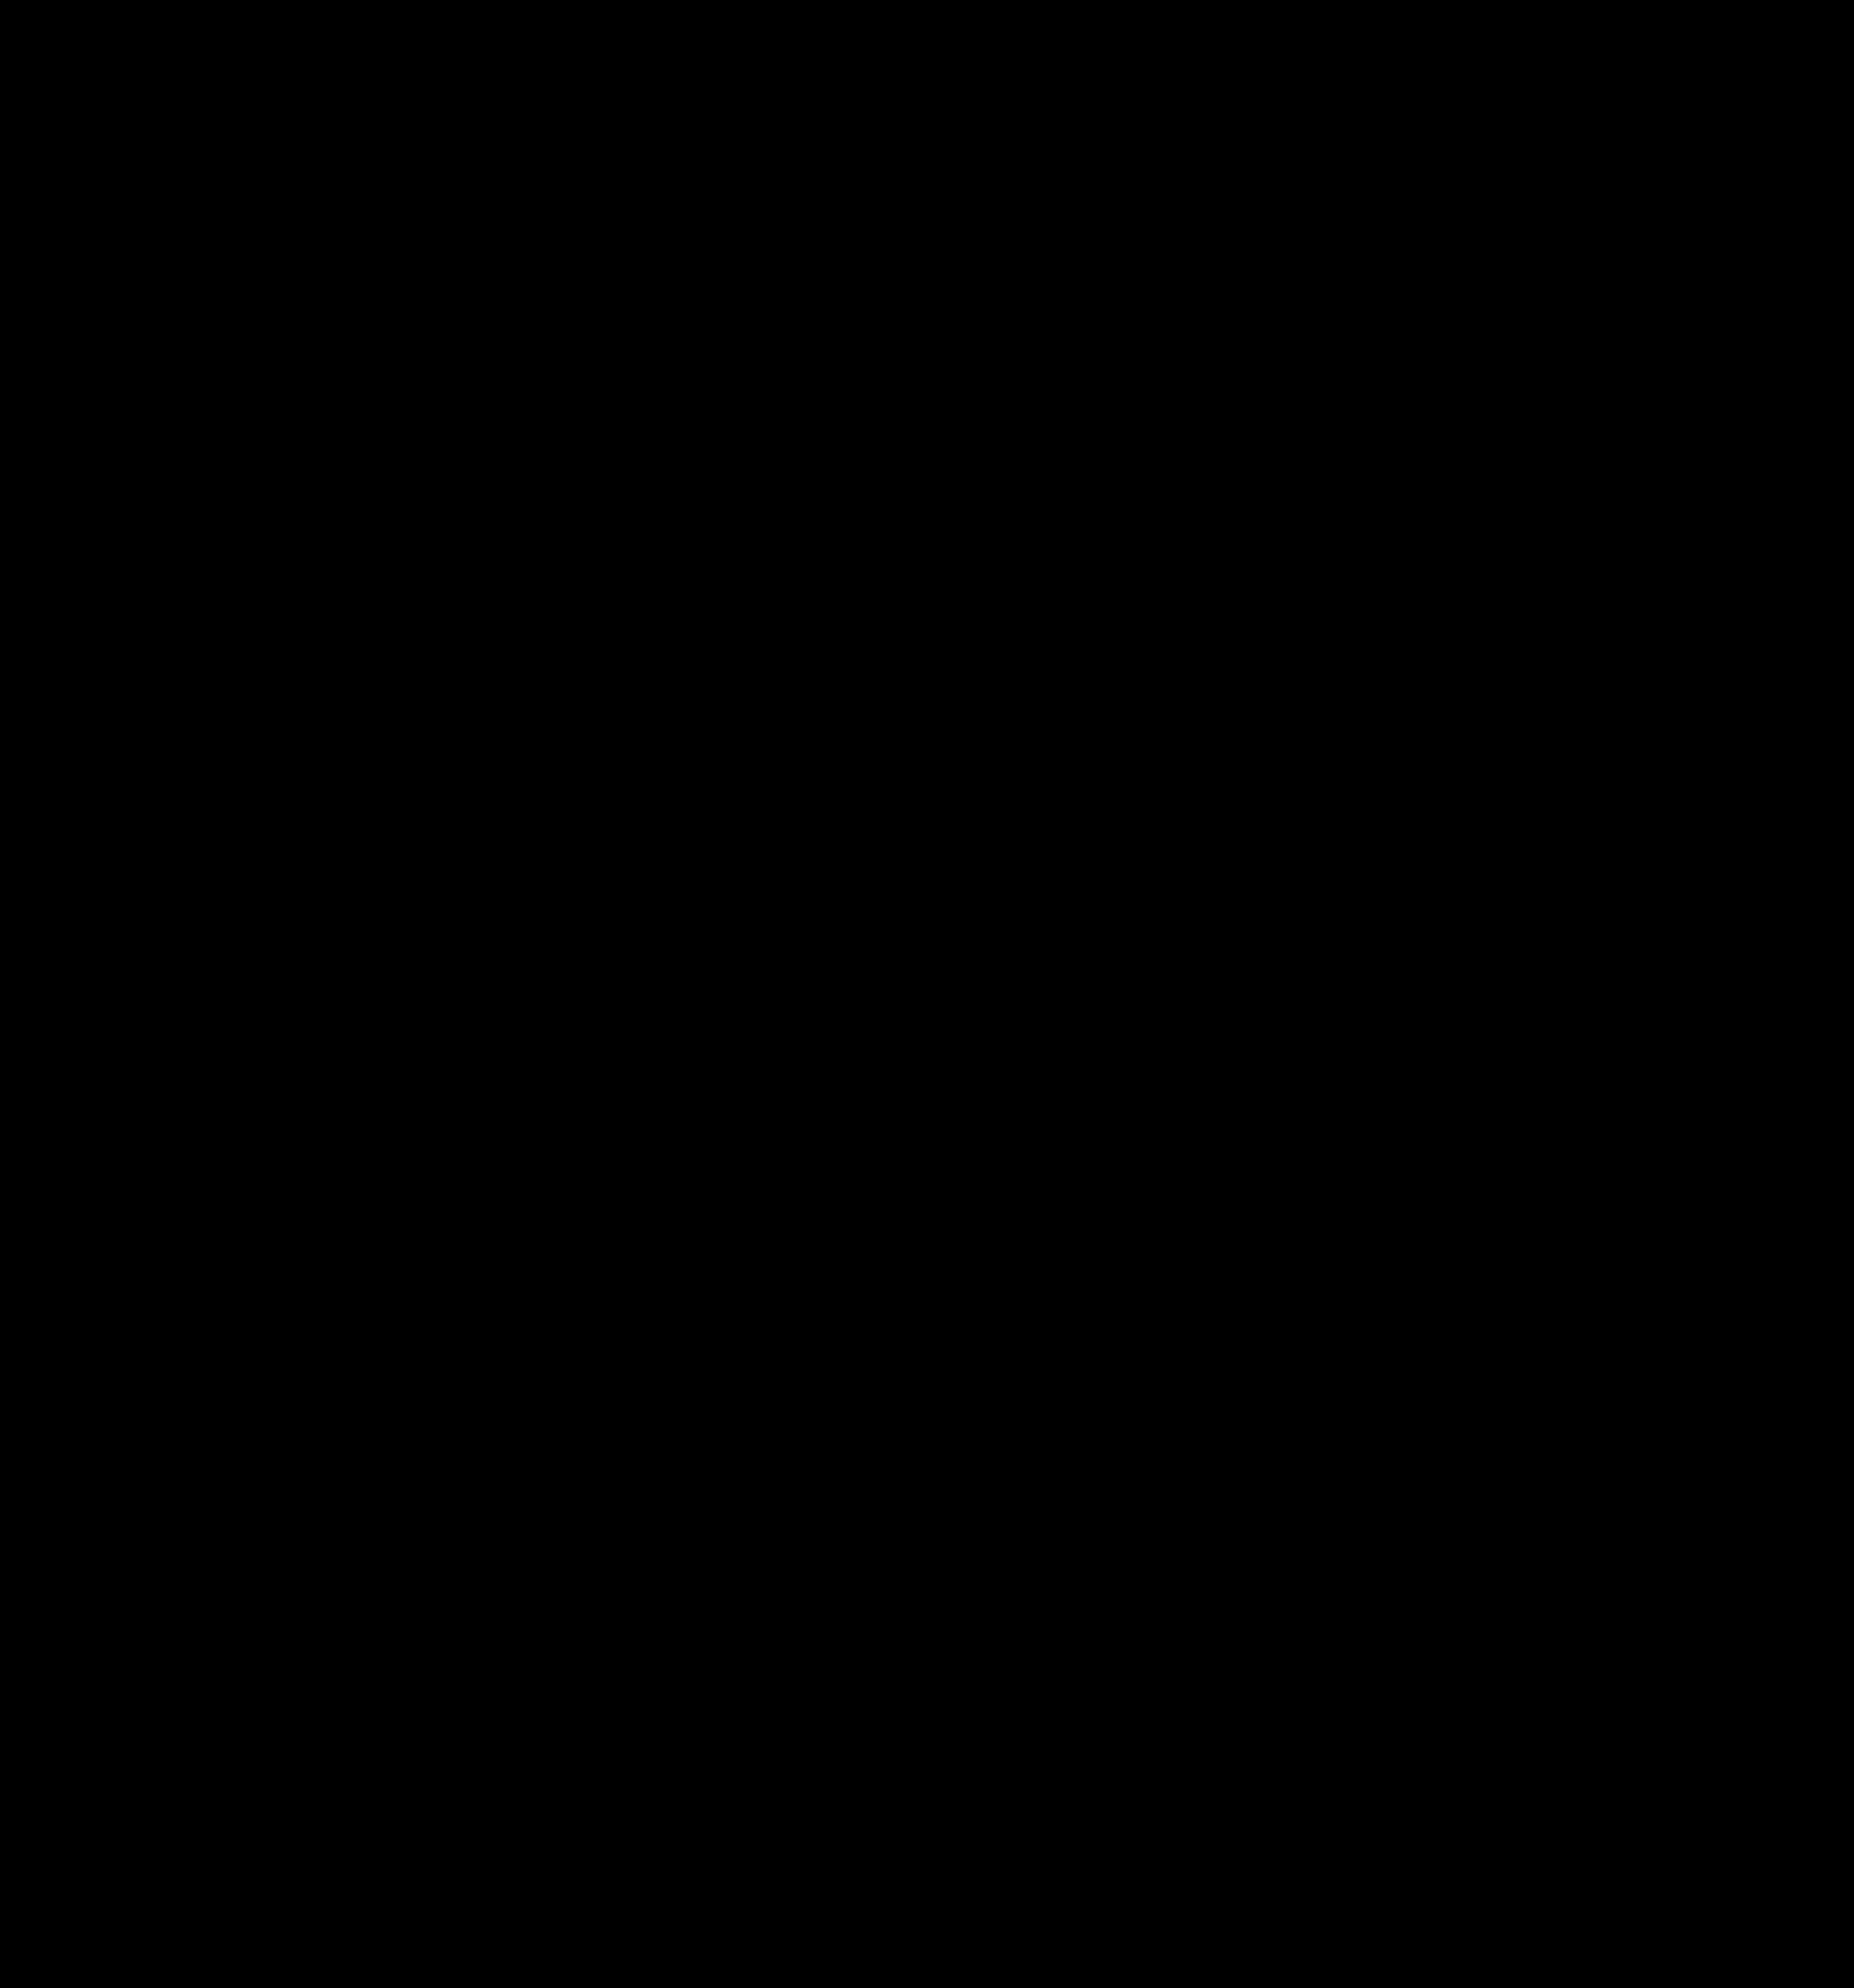 Clipart picture of star jpg Clipart - Star jpg